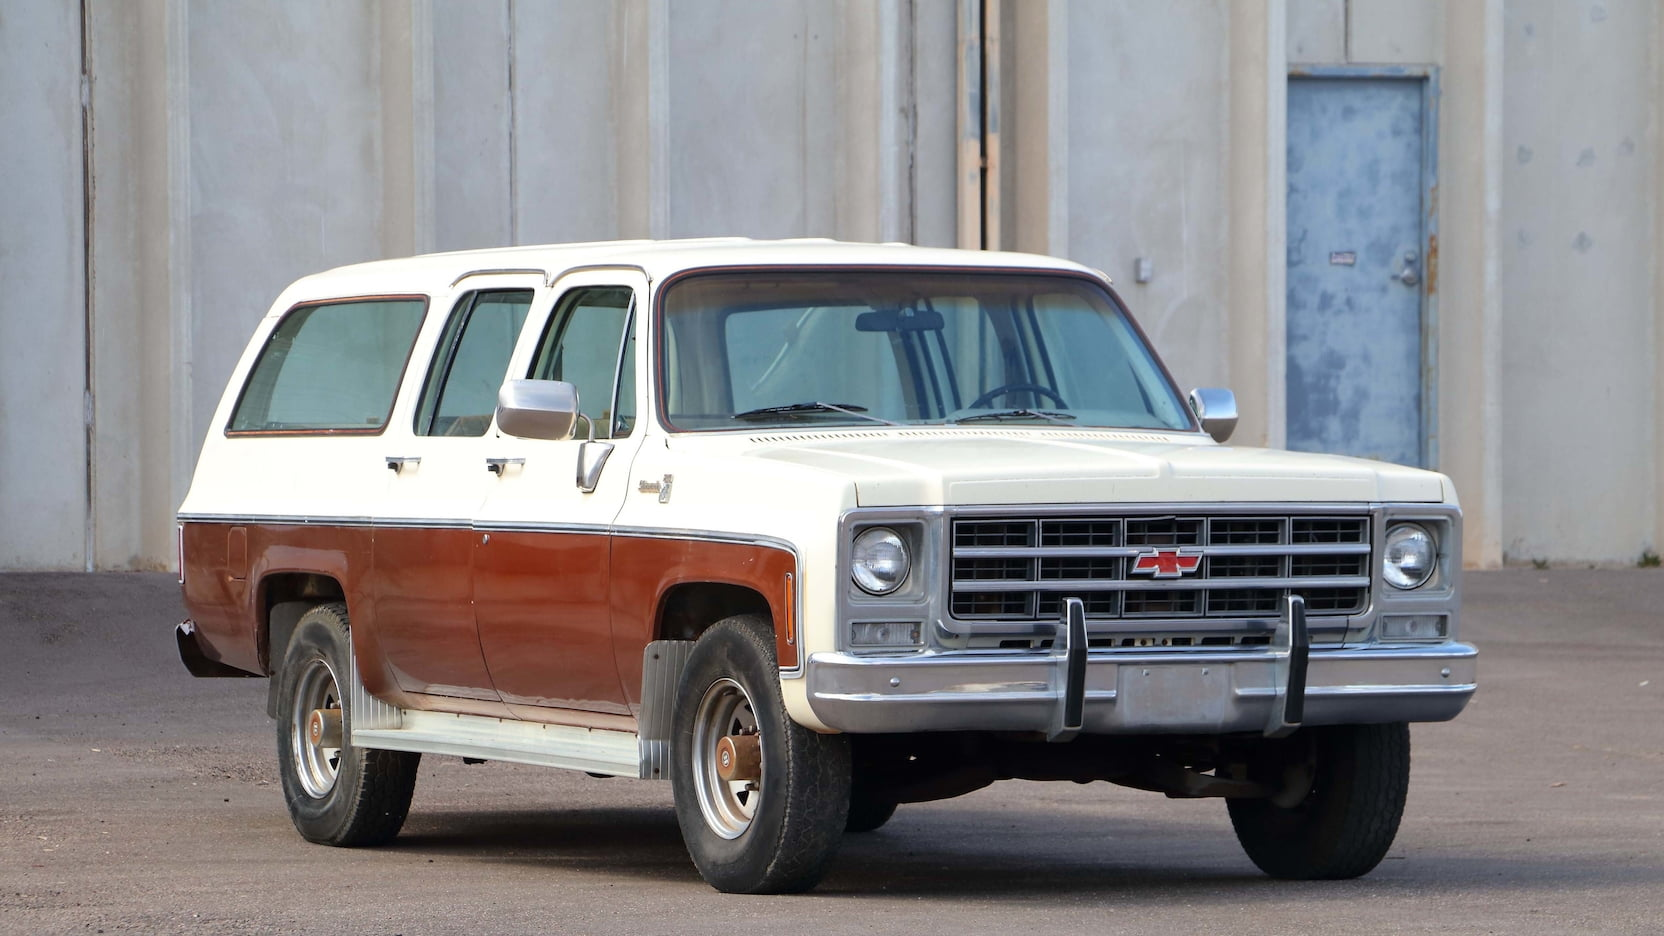 1979 Chevrolet Suburban 3/4